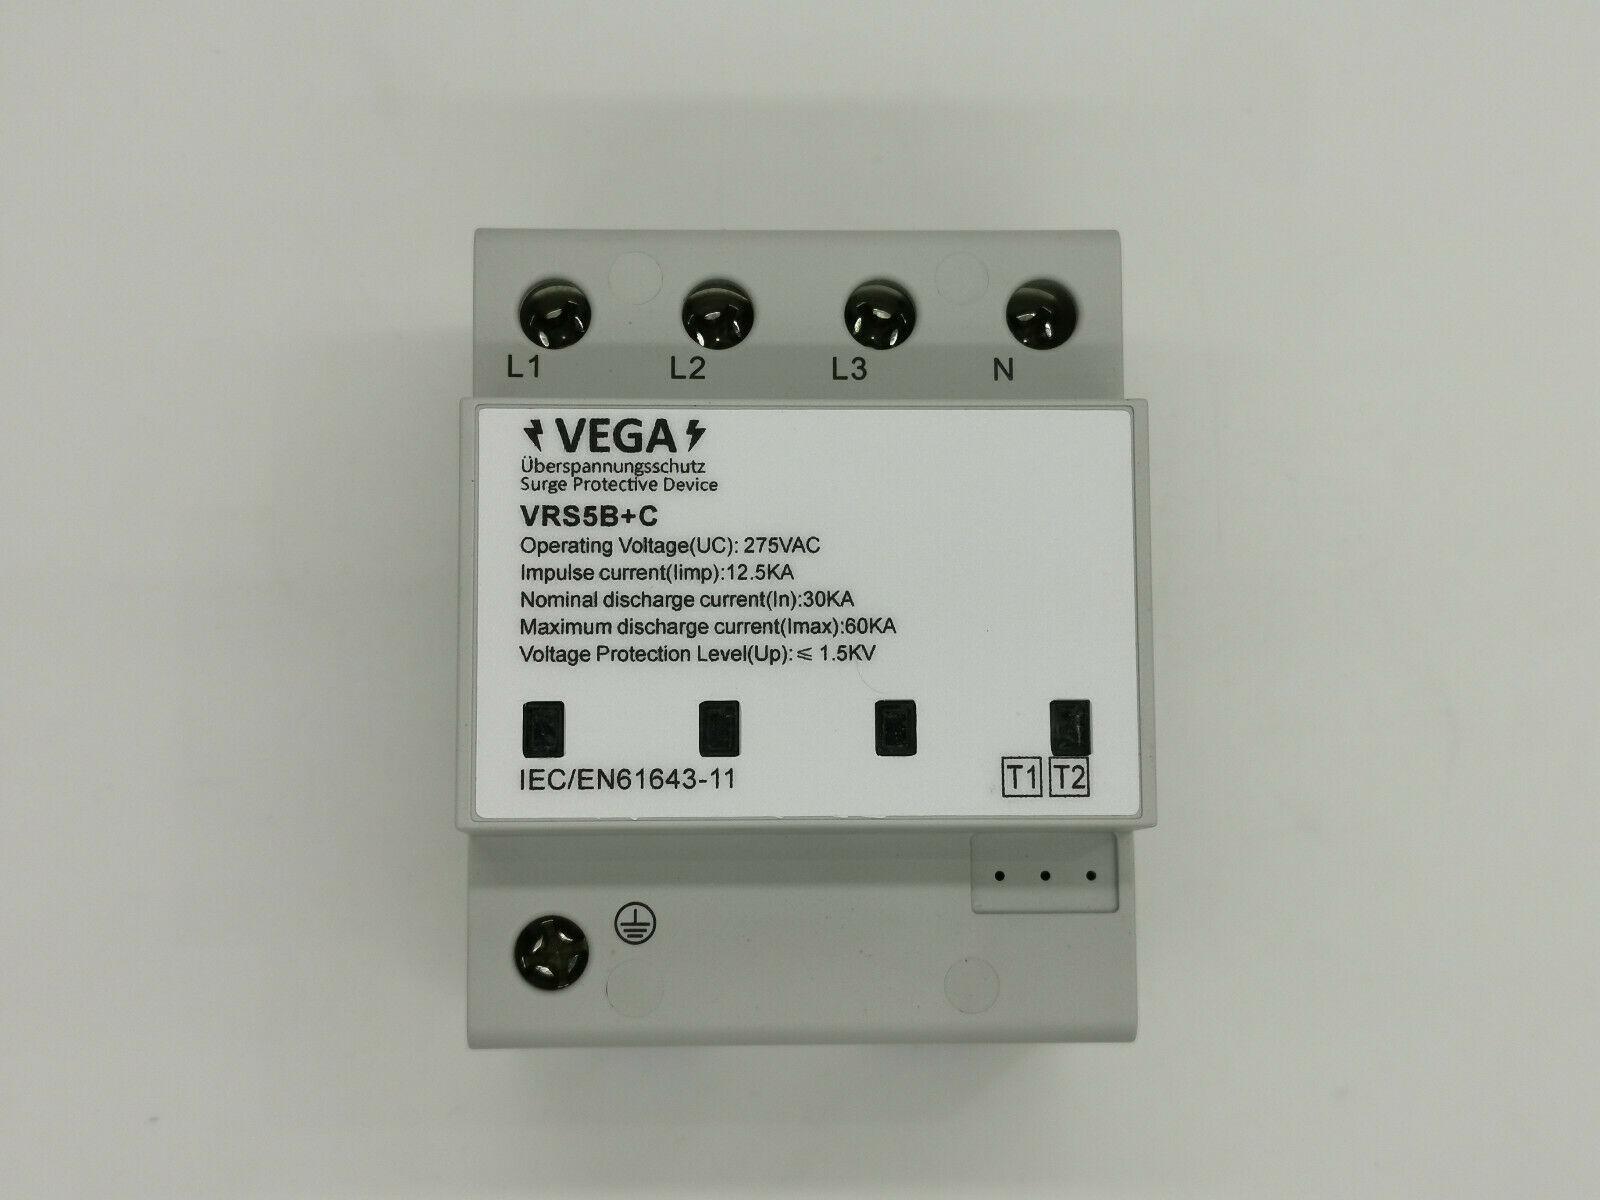 Blitz- Überspannungsschutz, Kombiableiter AC 4-polig, Imax 60 kA Imp 12,5kA, T1 T2